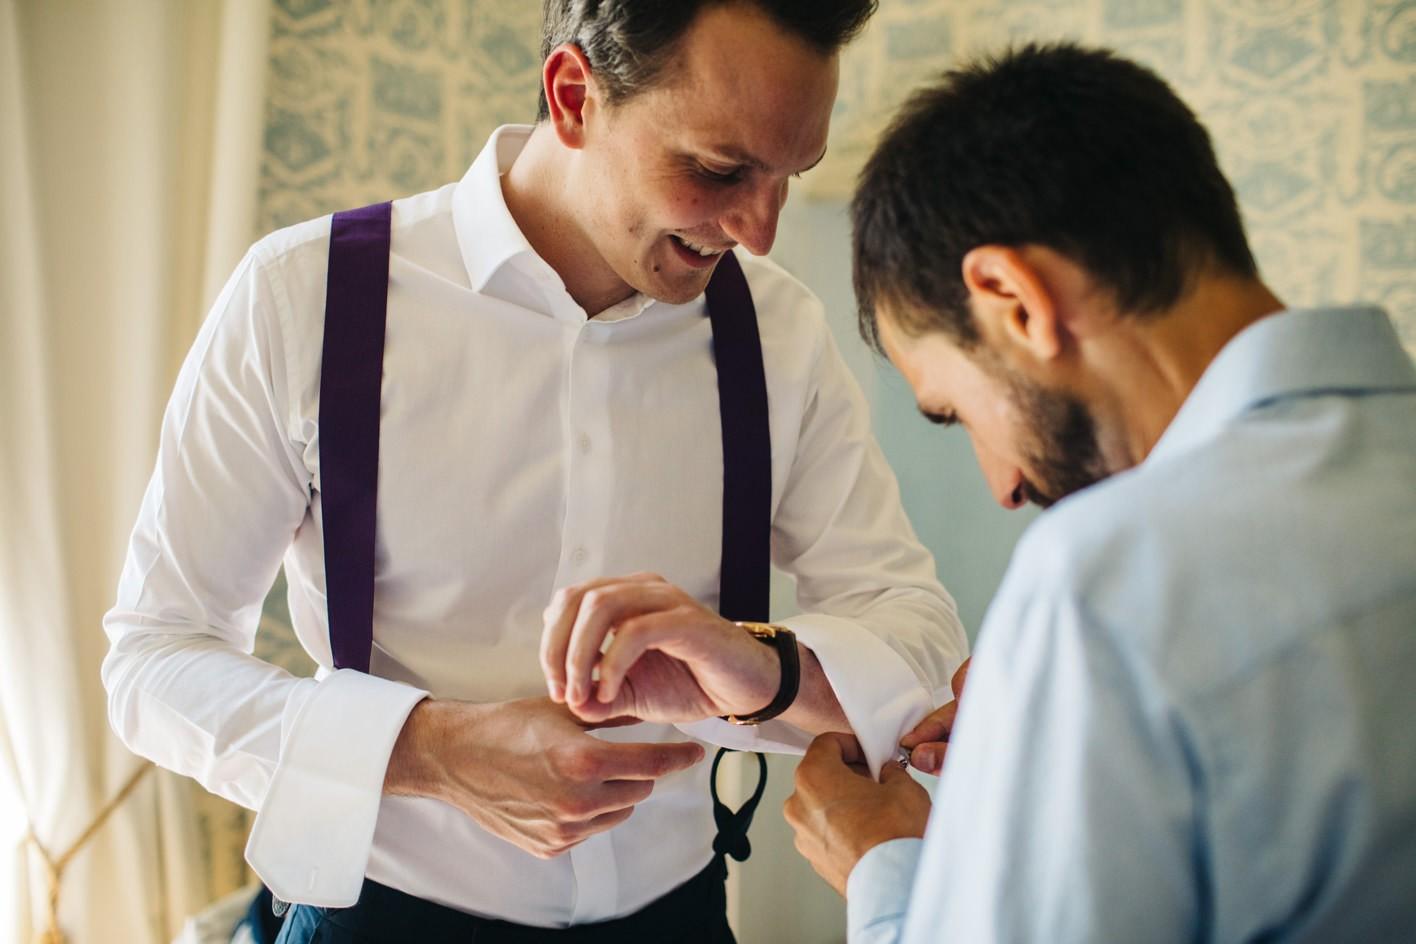 usher helps groom get ready